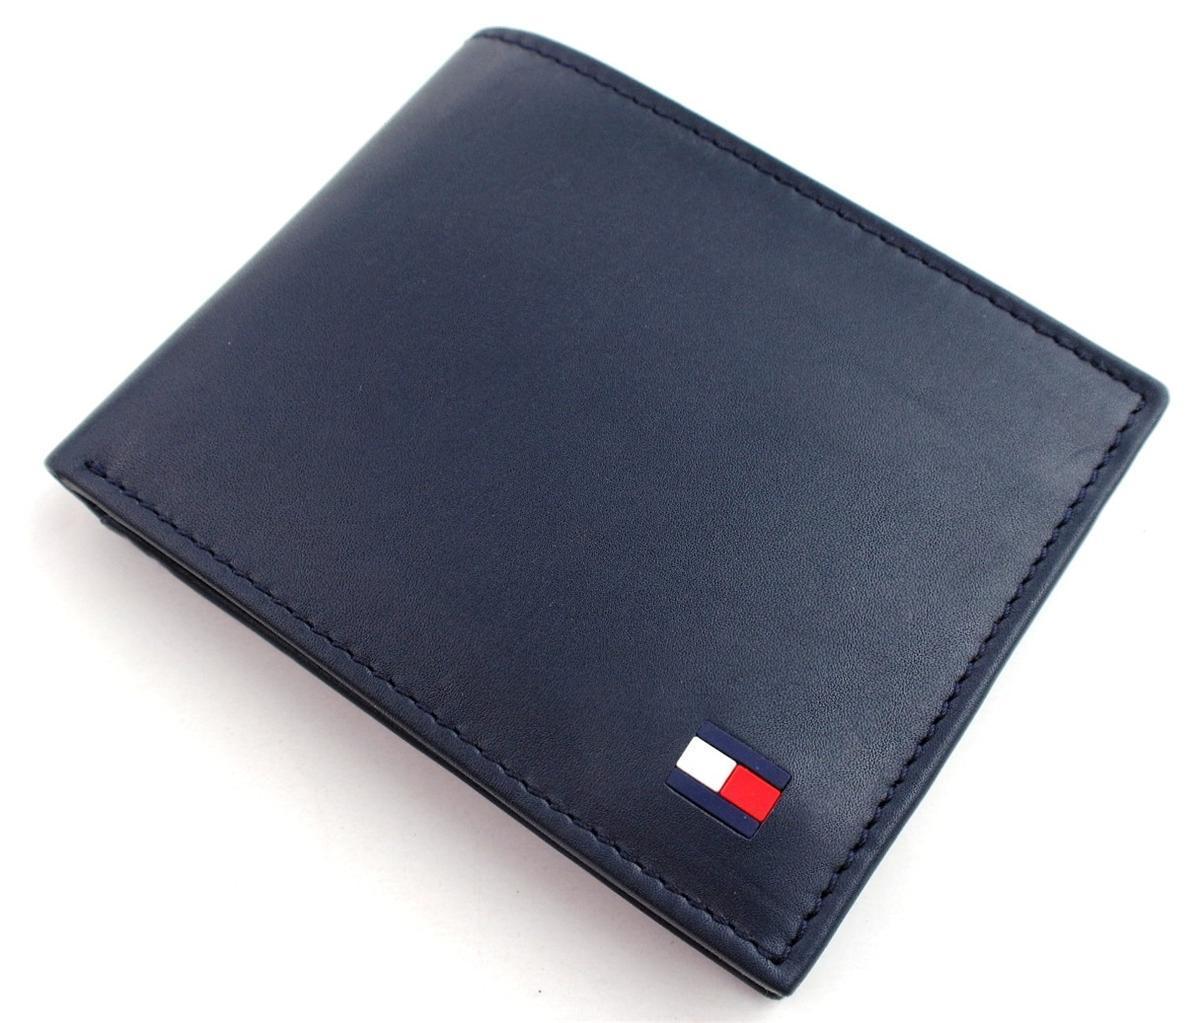 Tommy-Hilfiger-Men-039-s-Premium-Leather-Credit-Card-ID-Wallet-Passcase-31TL22X046 thumbnail 28